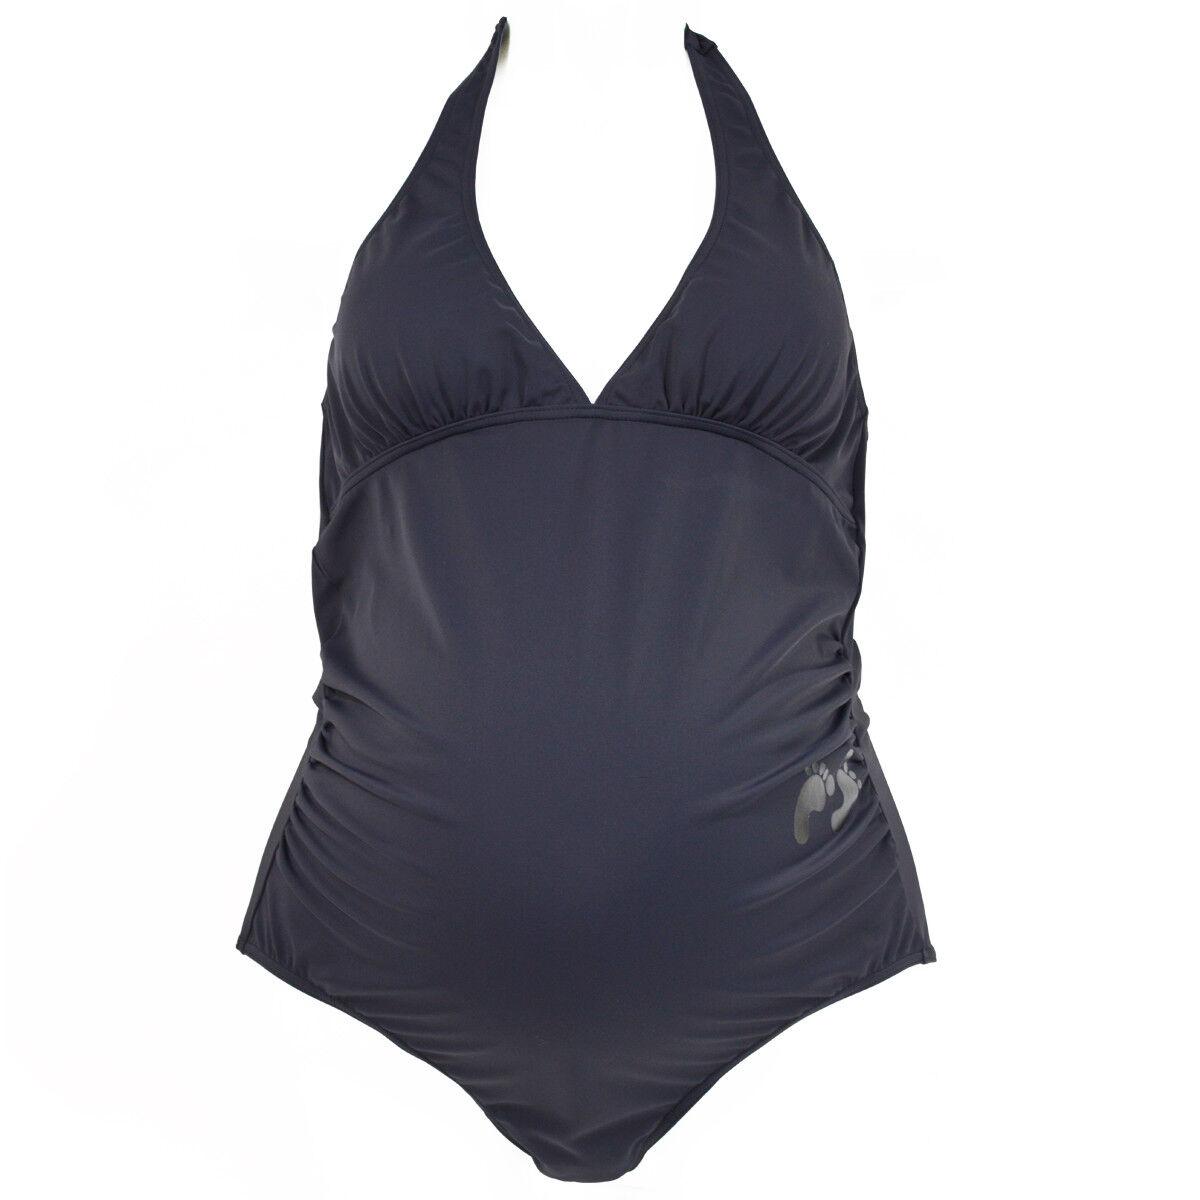 1a137ec253 Splash About Maternity Swimming Costume Little Feet Black 10 12 14 ...